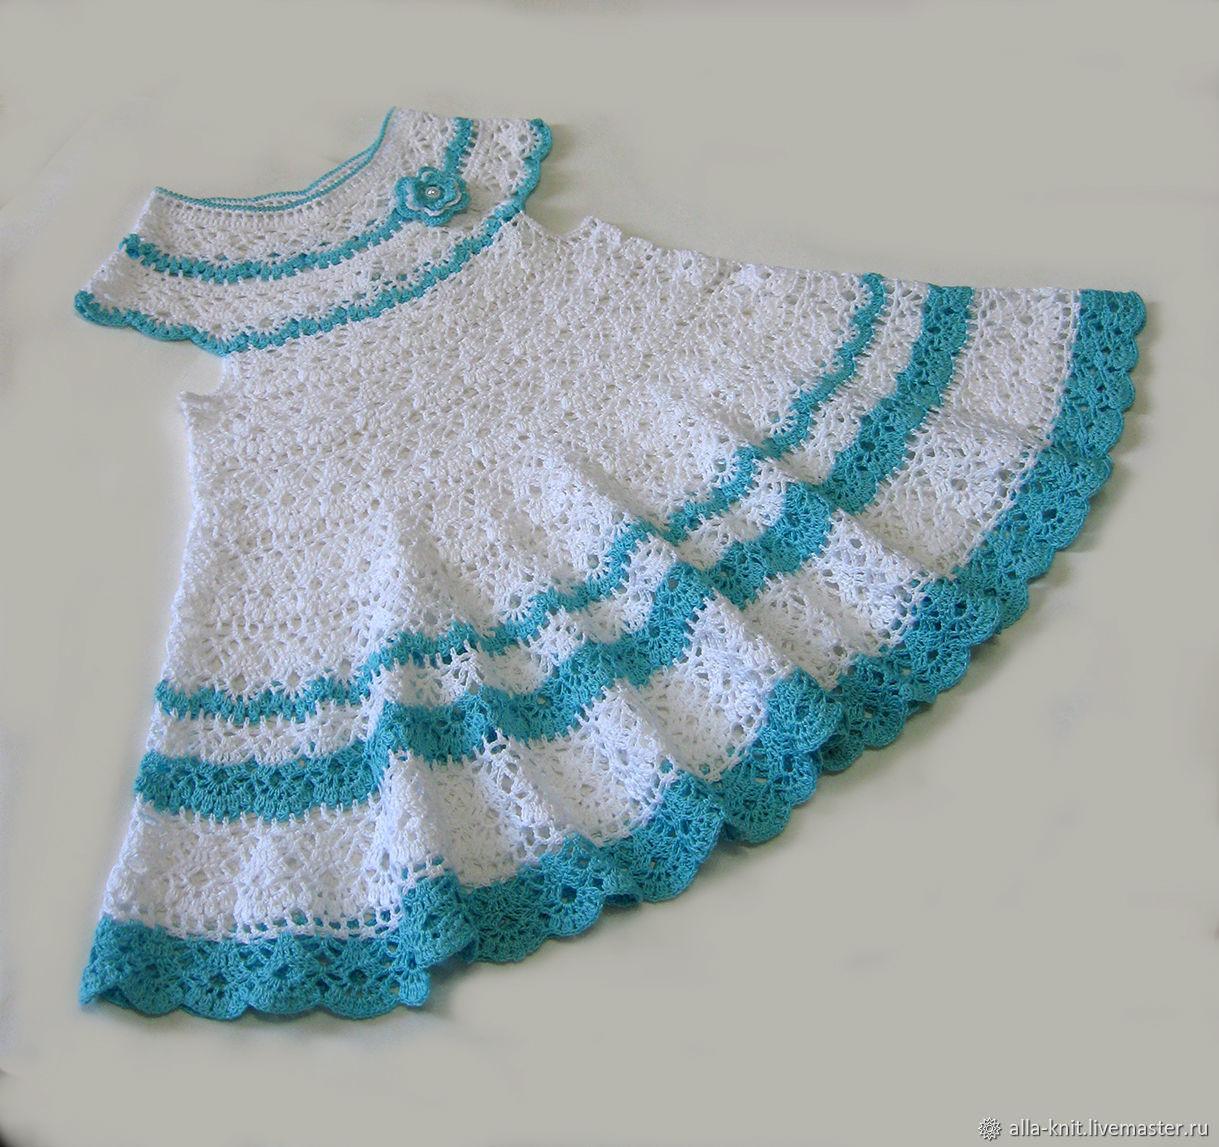 Crocheted Girls Dress Baby Dress Knit Dressy P Shop Online On